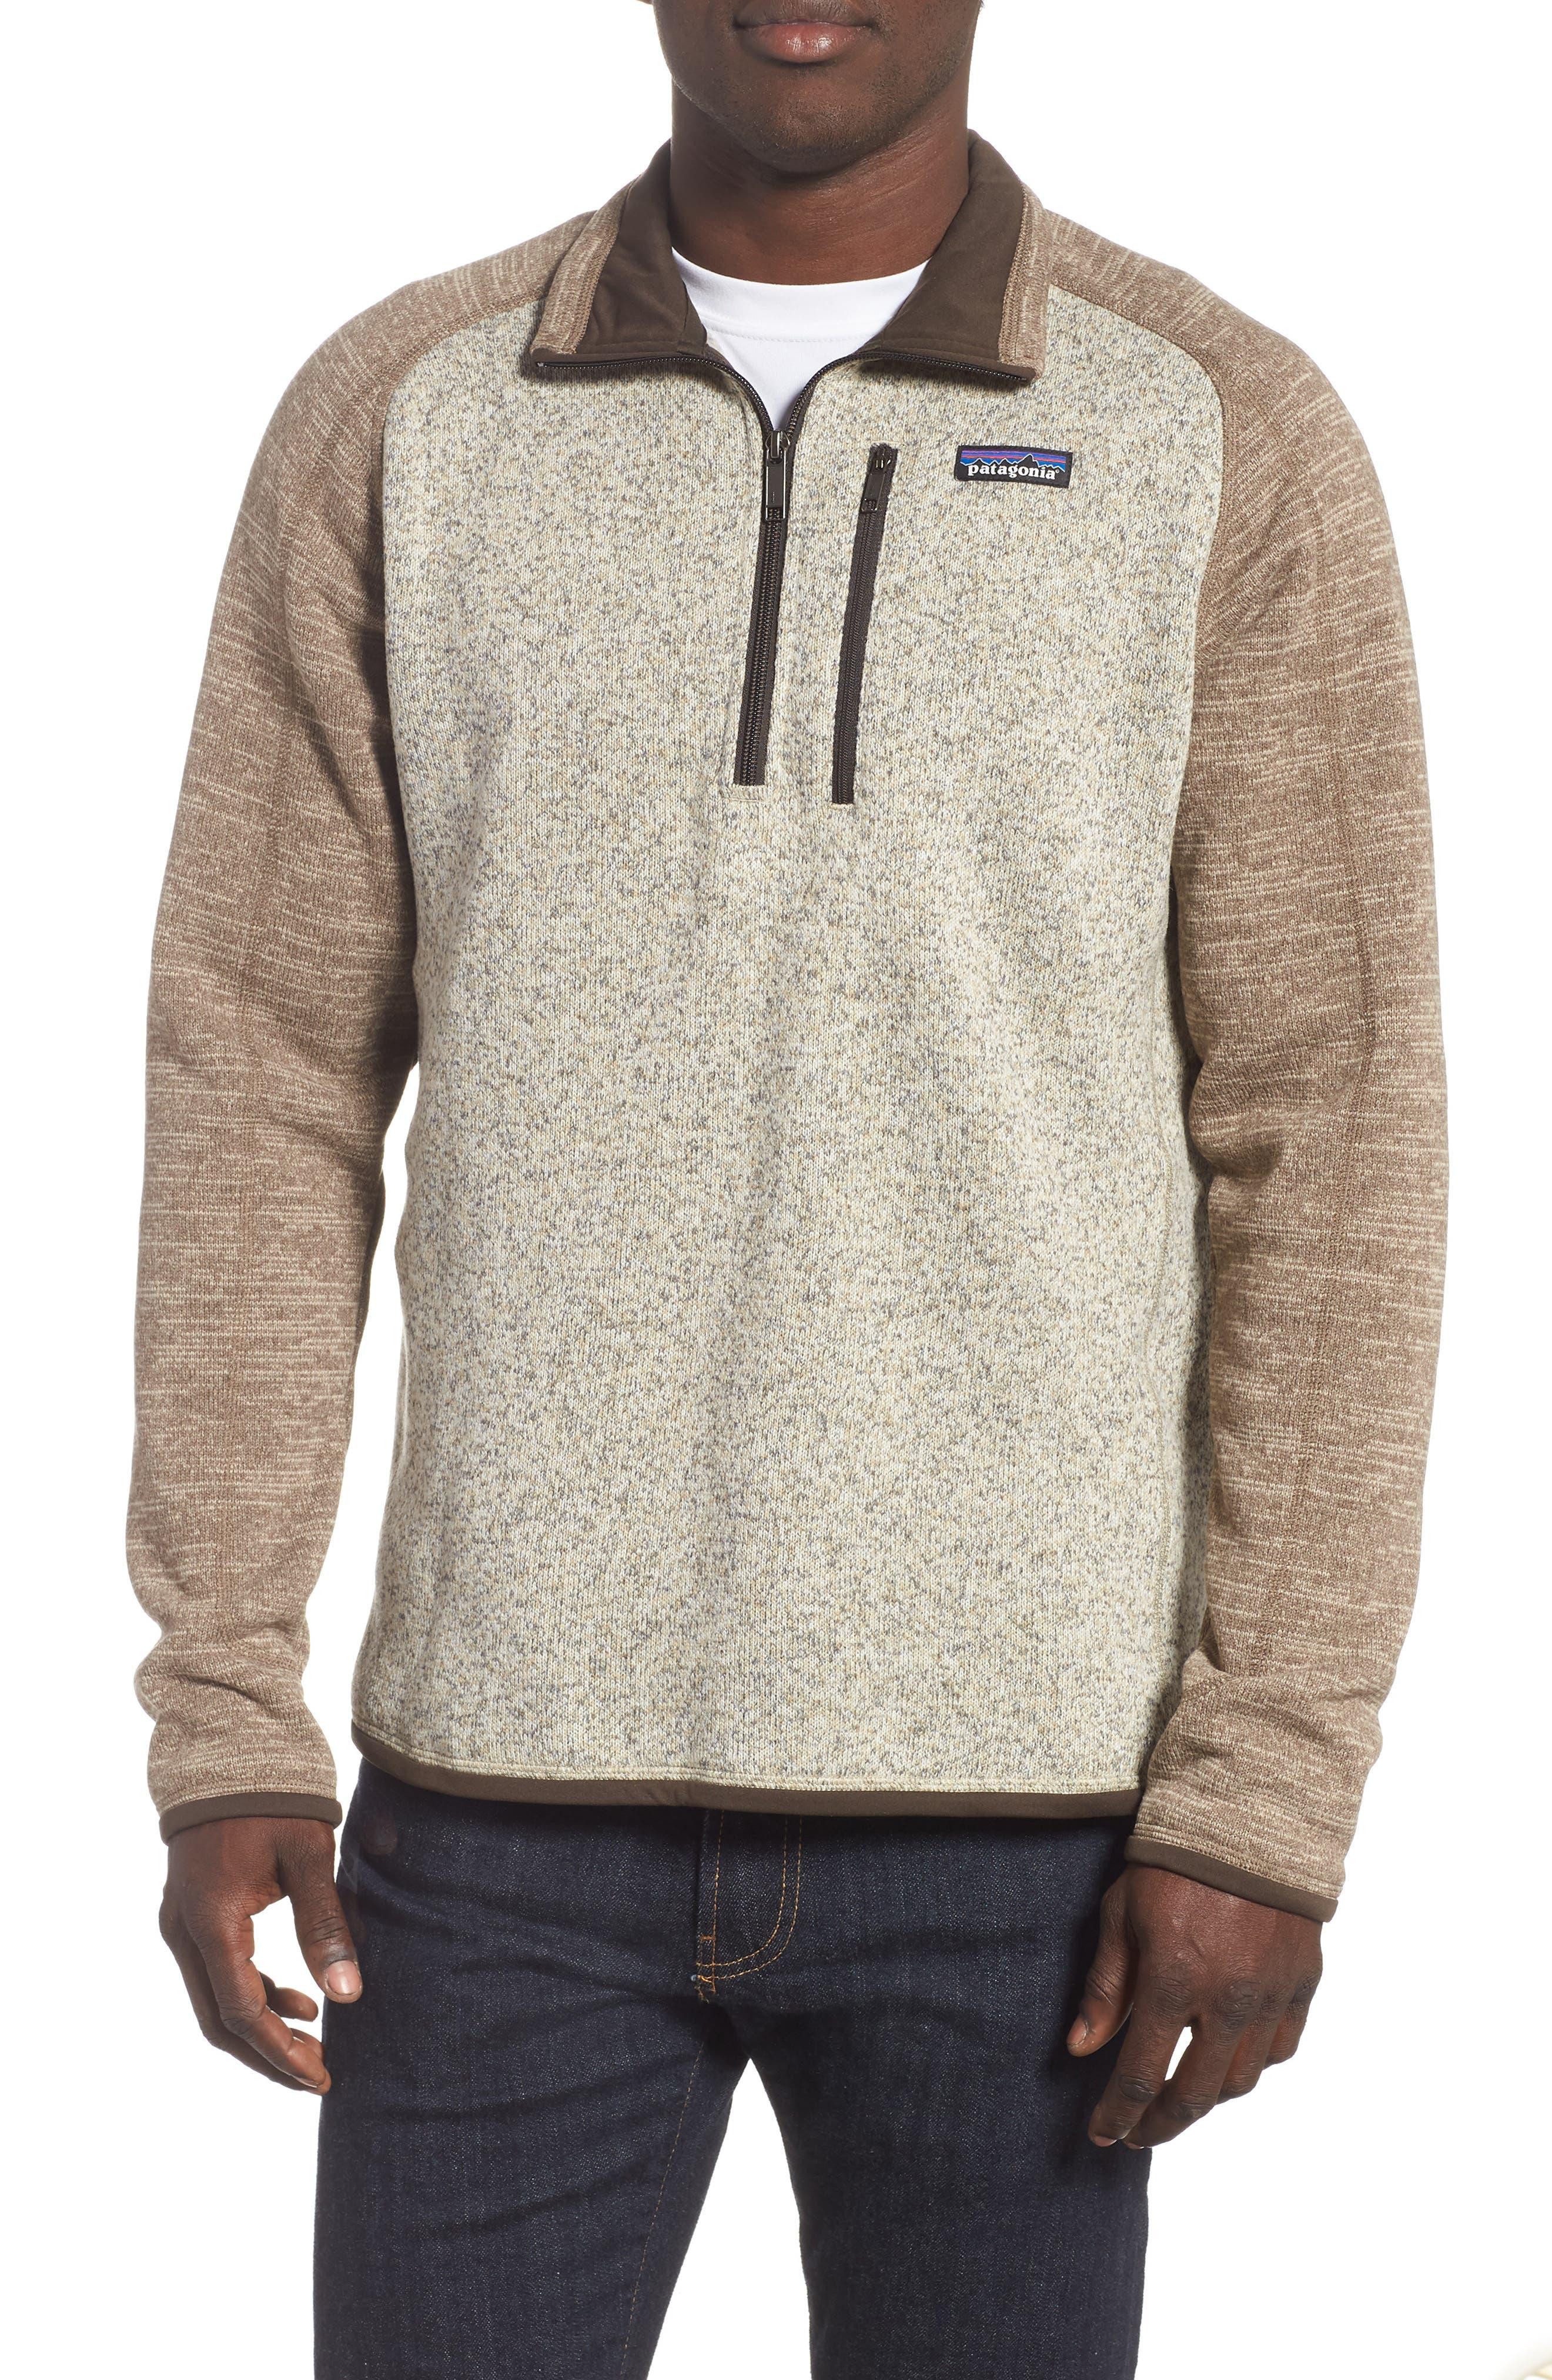 Patagonia Better Sweater Quarter Zip Fleece Lined Pullover, Beige